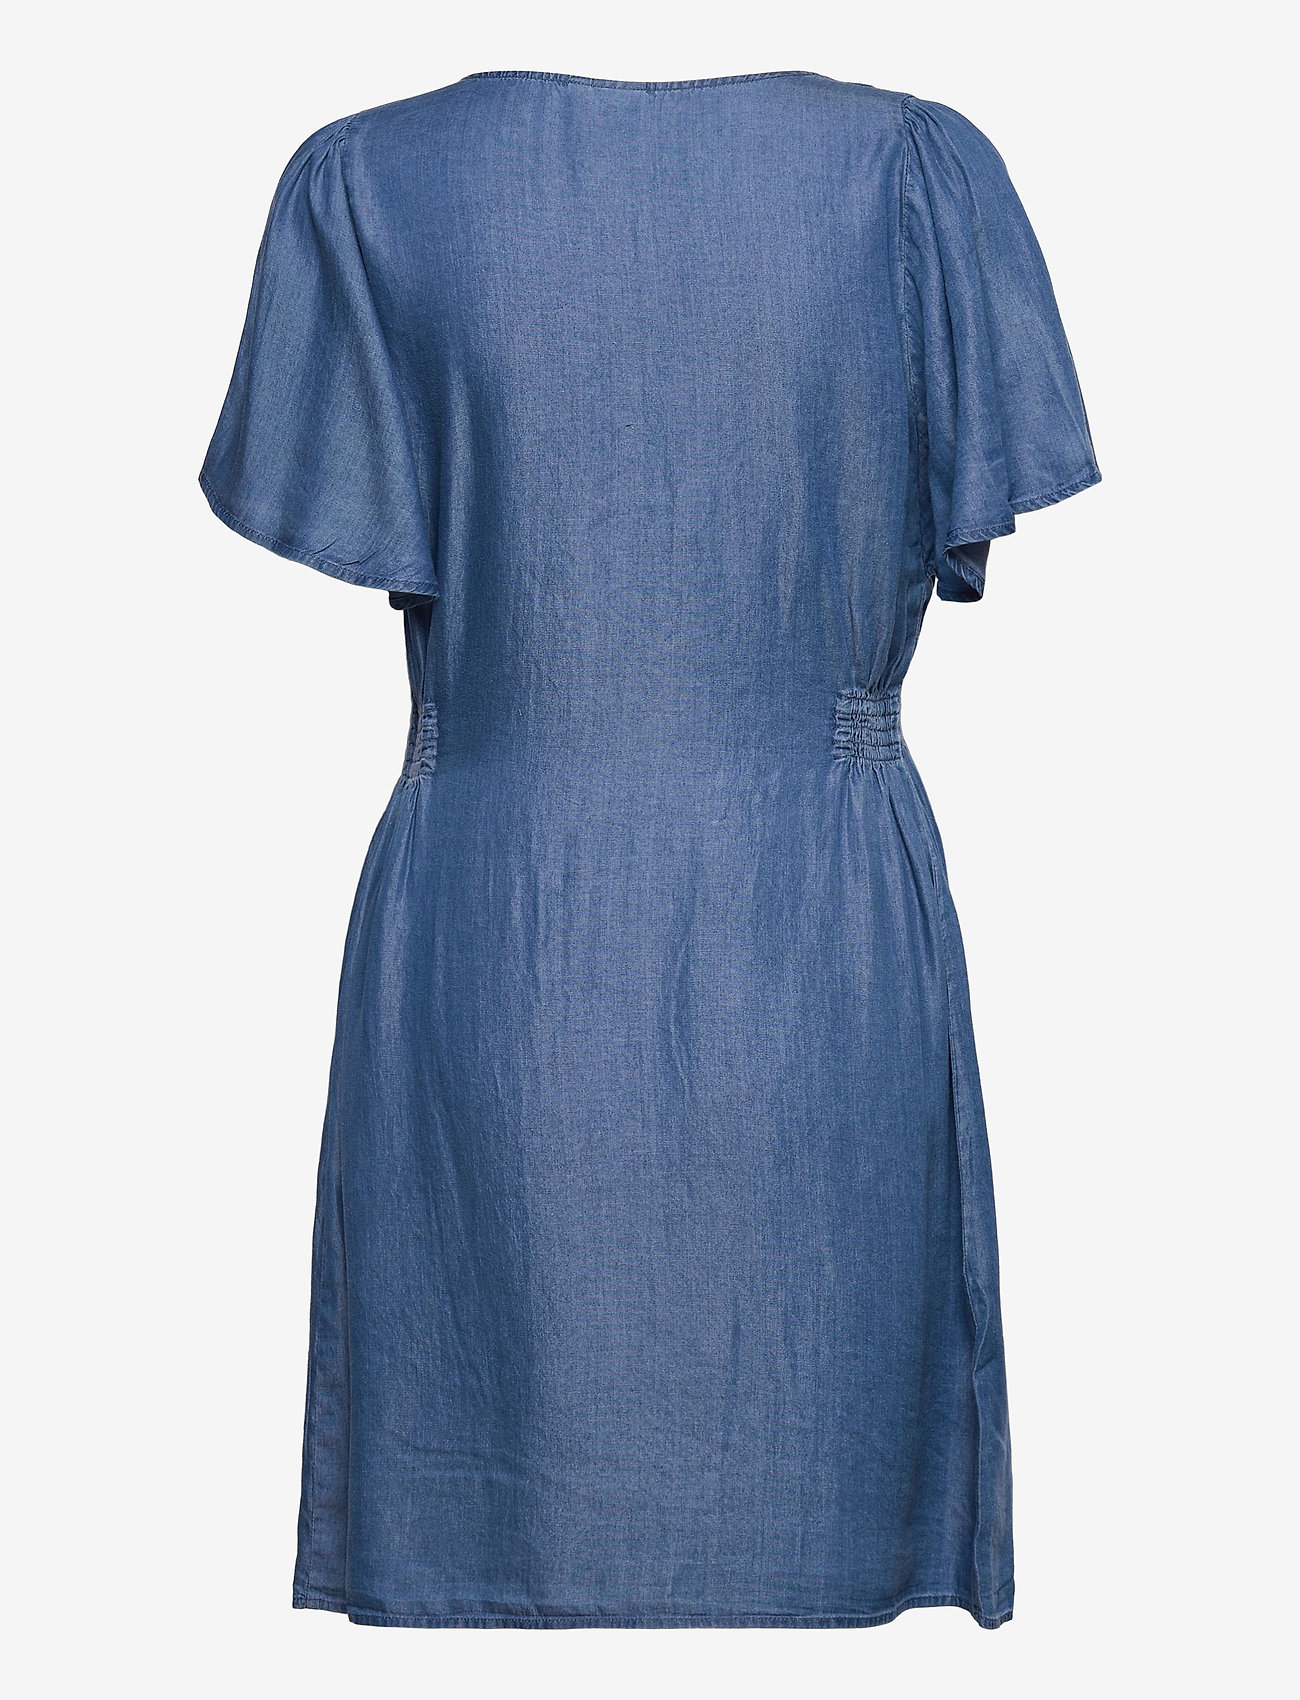 ICHI - IHLAMBREY DR3 - summer dresses - medium blue - 2